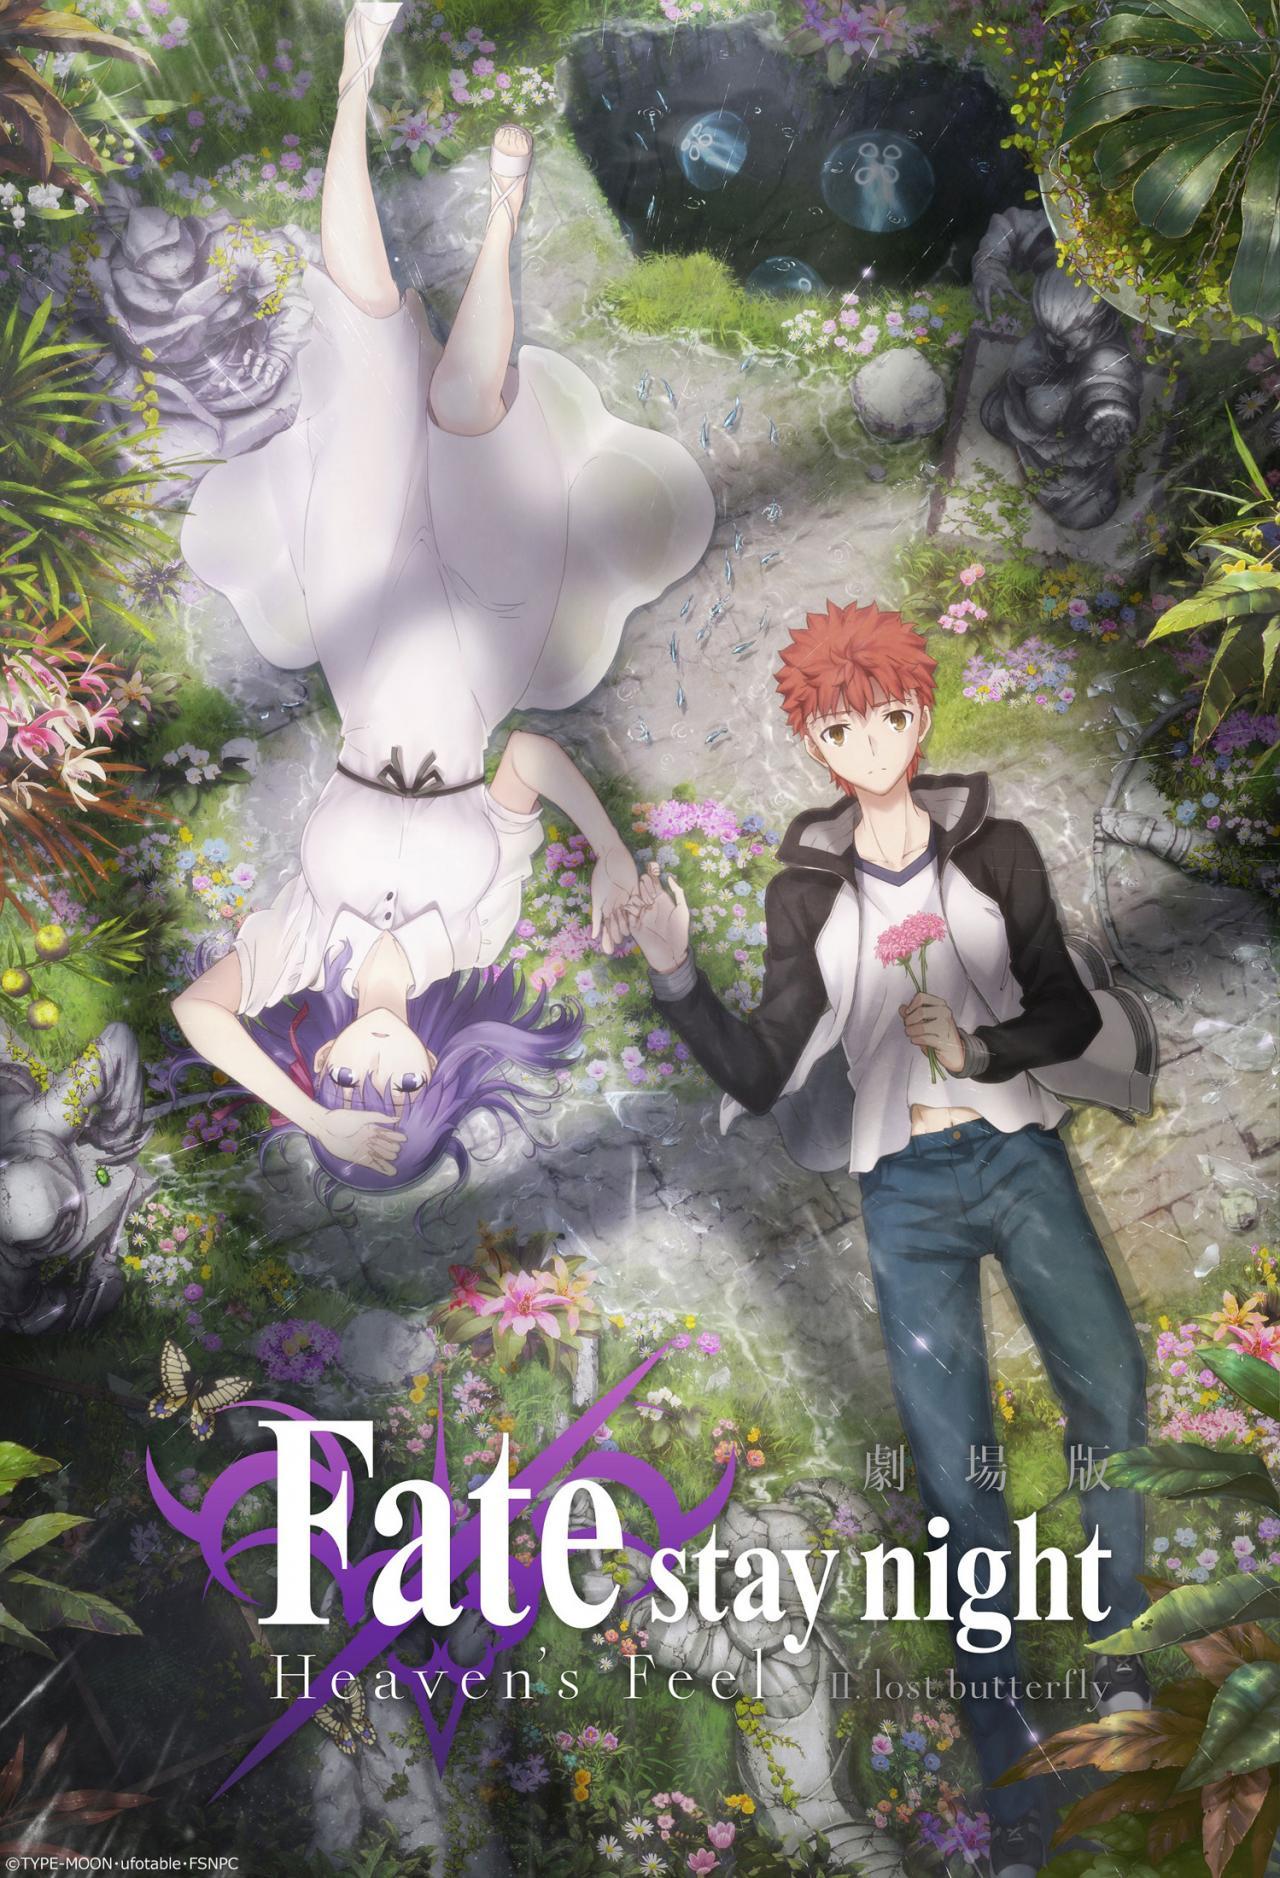 【动漫资源】【中文字幕】Fate/stay night [Heaven's Feel]第二章《lost butterfly》剧场版【1080P】蓝光预告